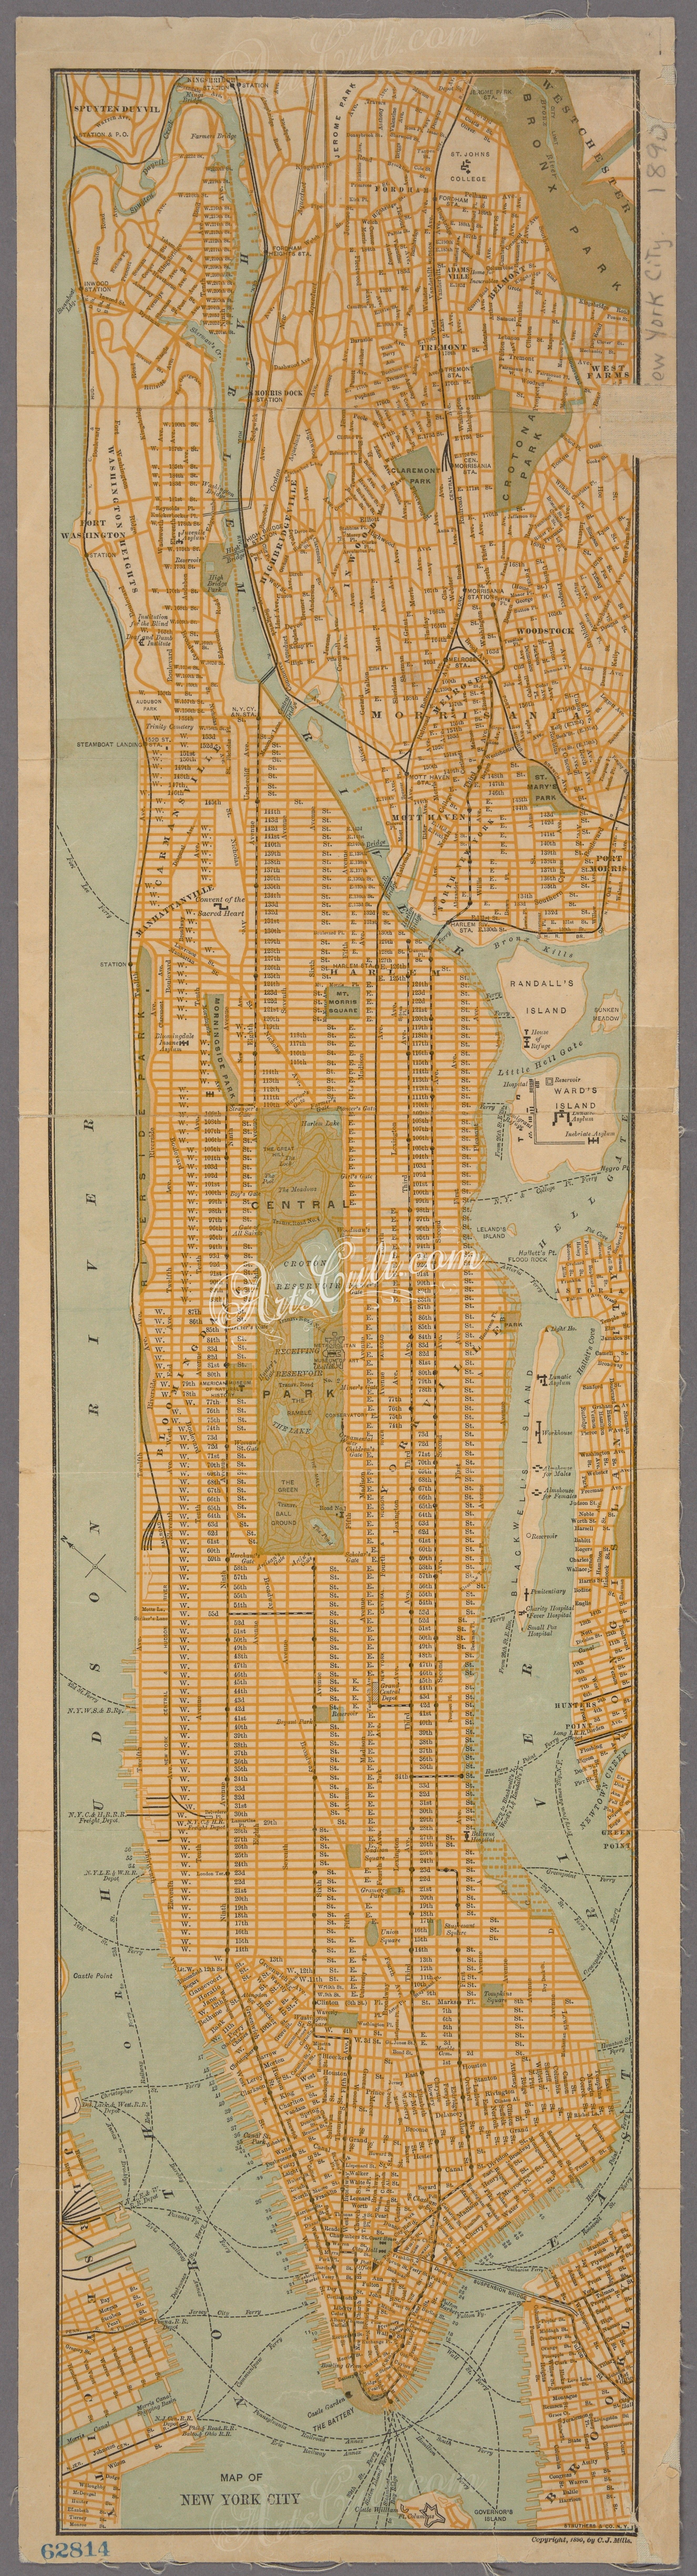 antiquemaps 03482 3989 Map of New York City ArtsCultcom